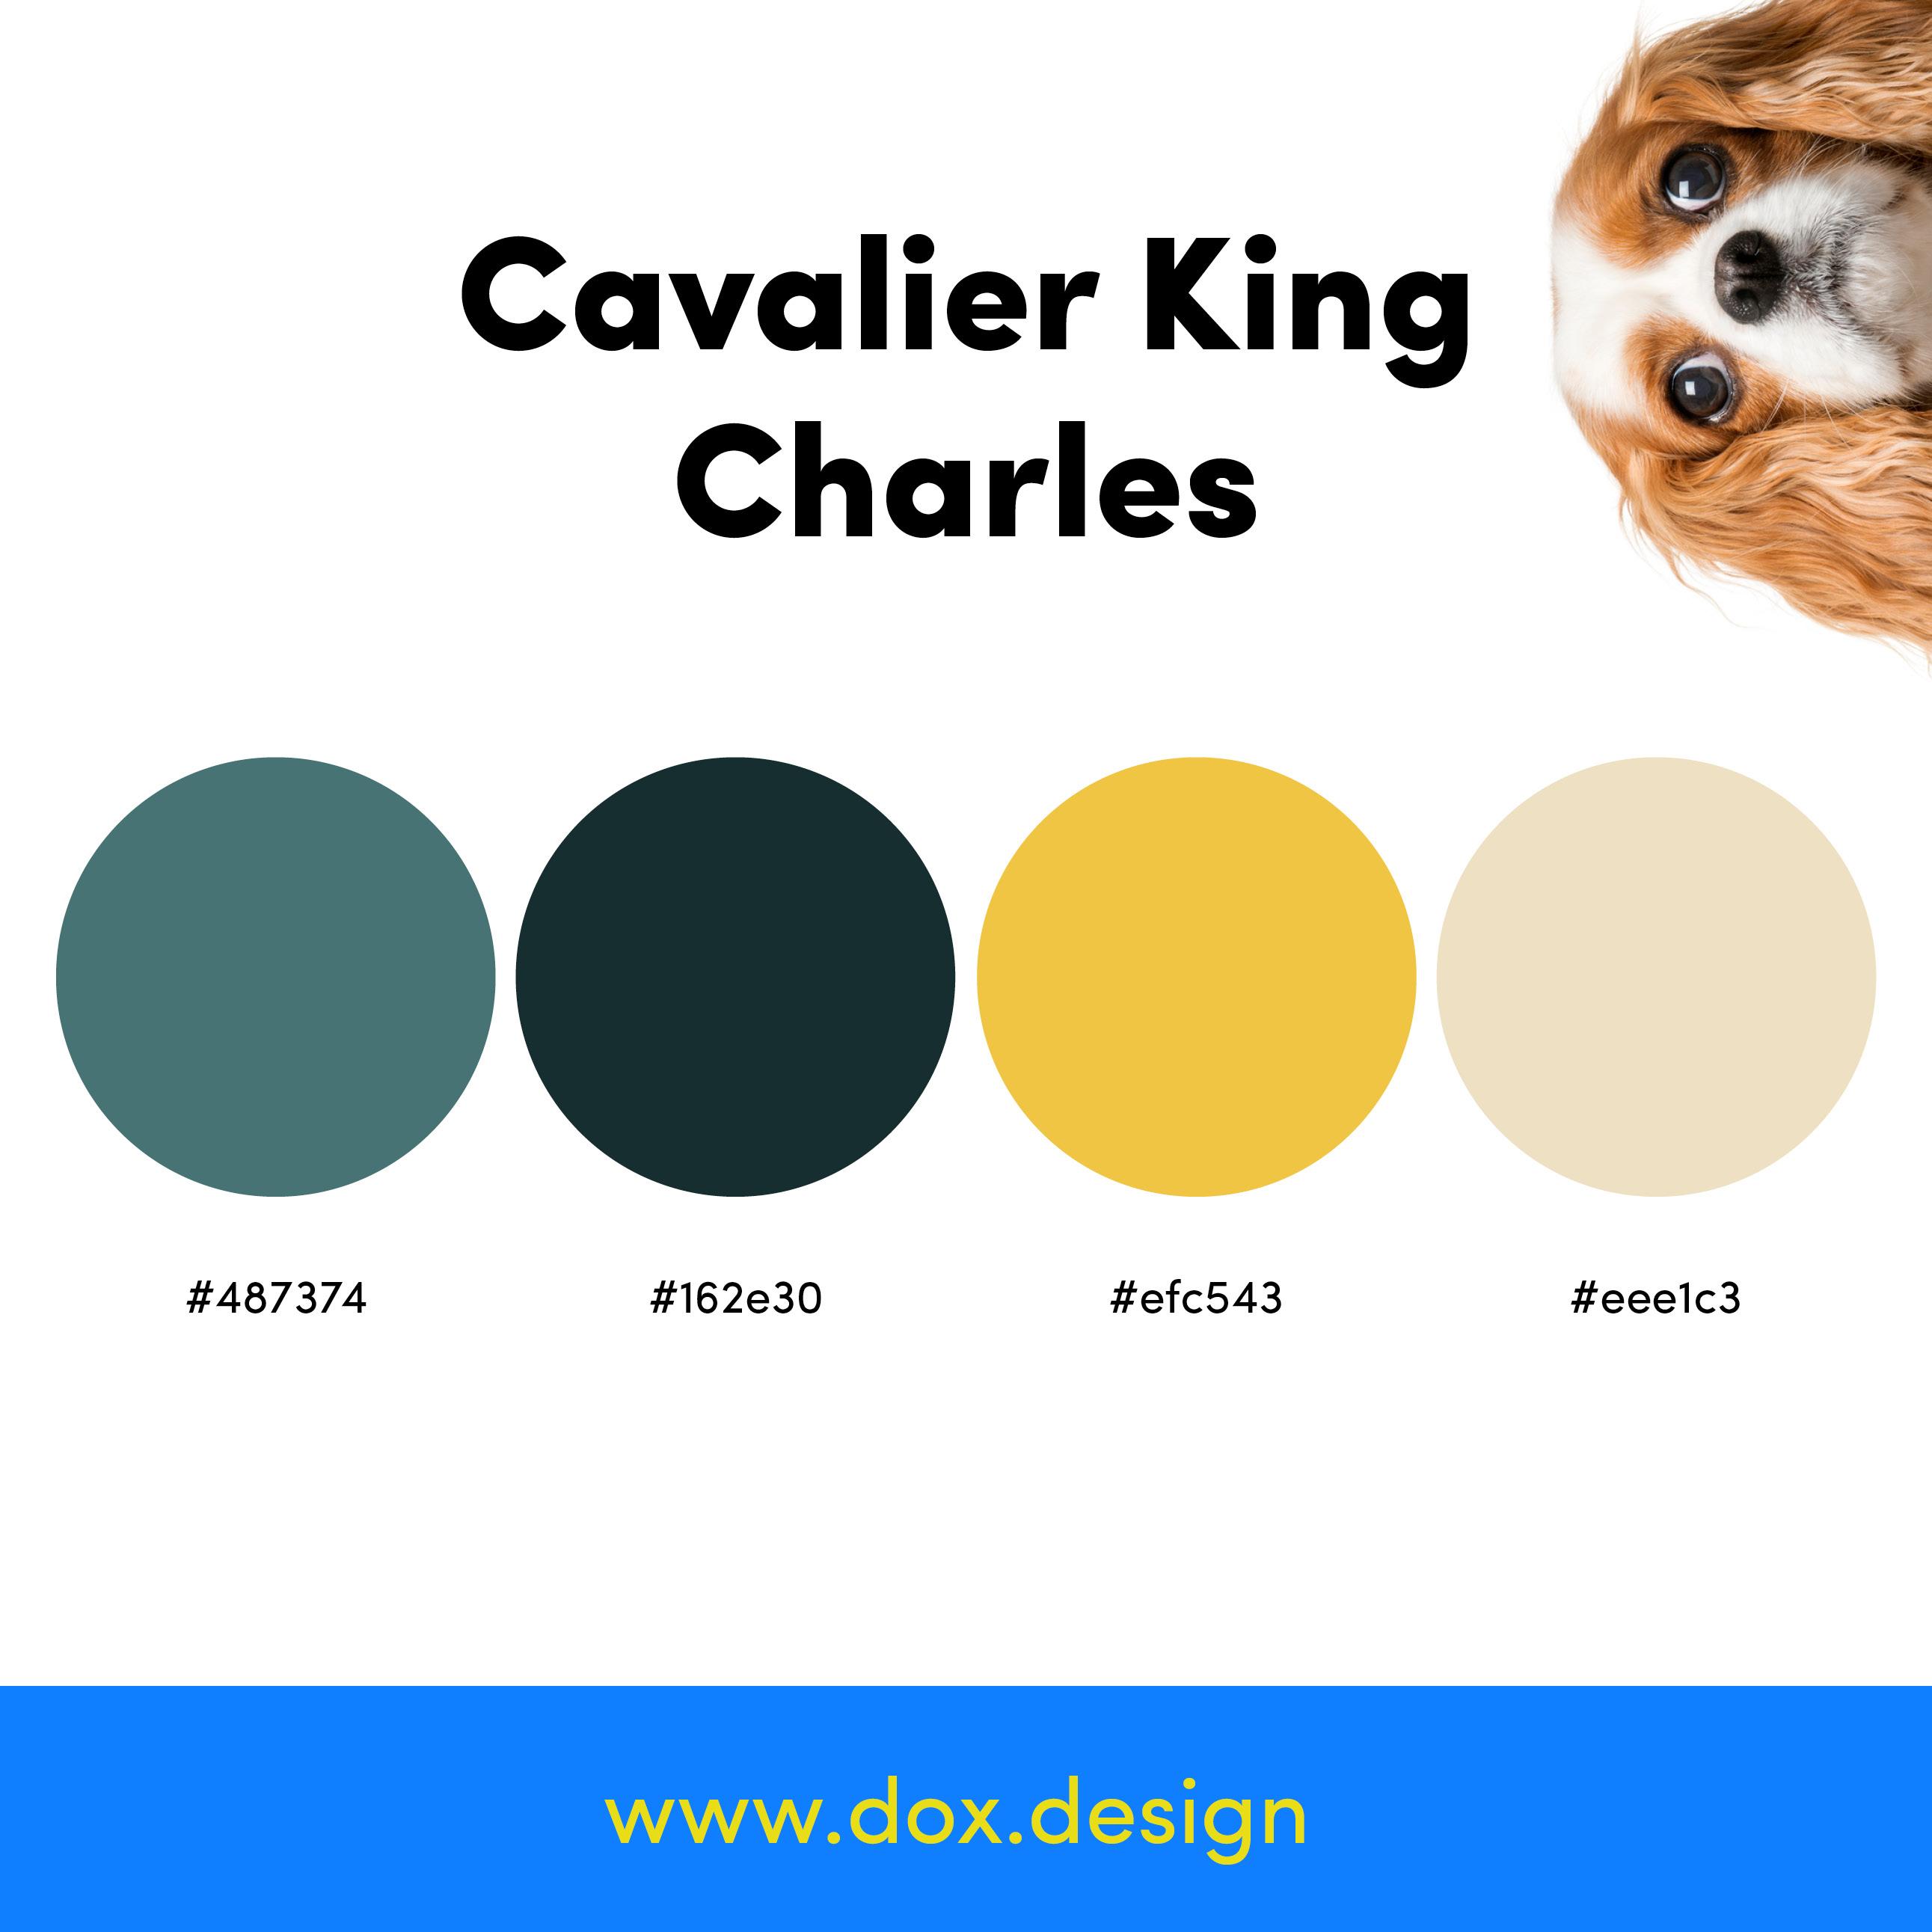 Cavilier King Charles color palette